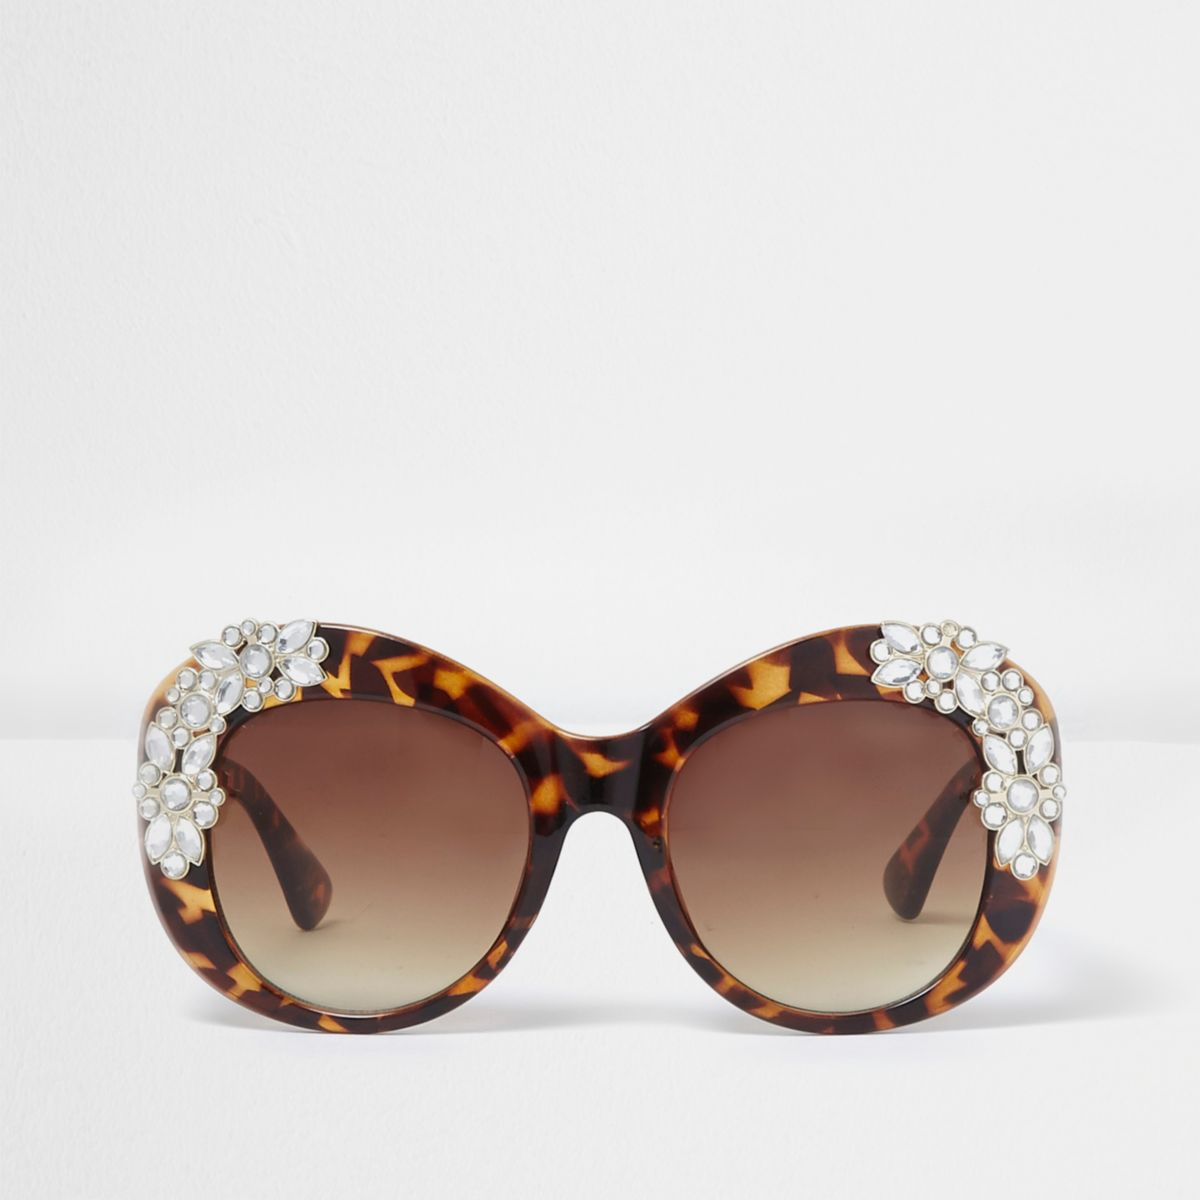 Brown tortoiseshell embellished sunglasses